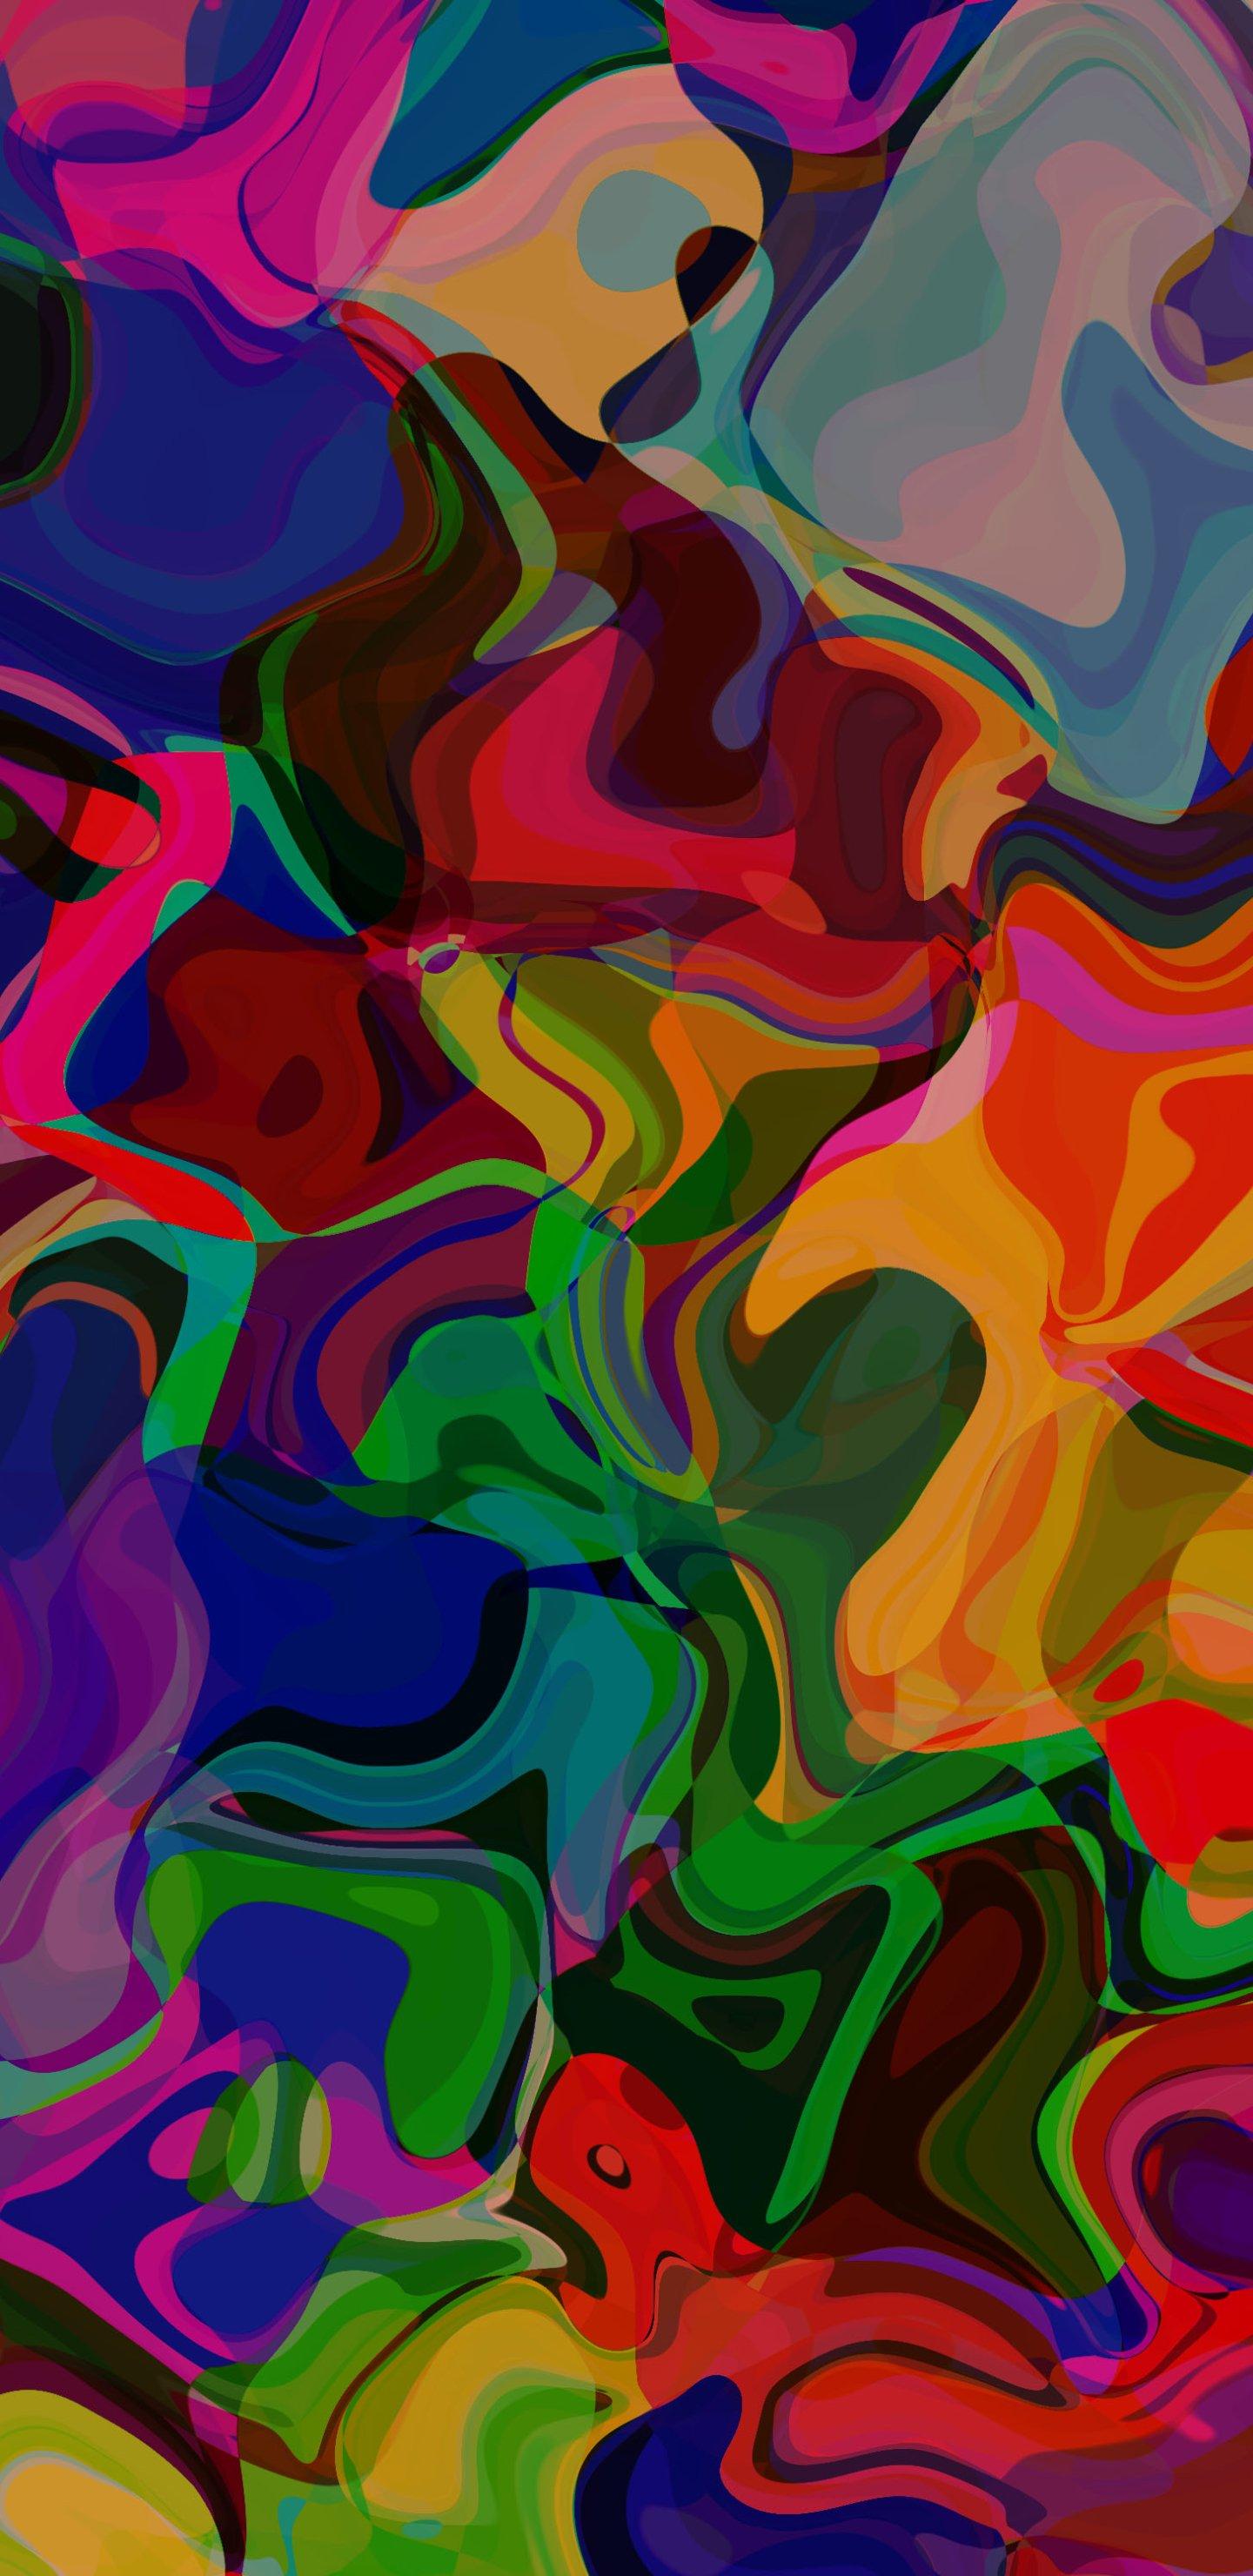 Wallpaper 774150